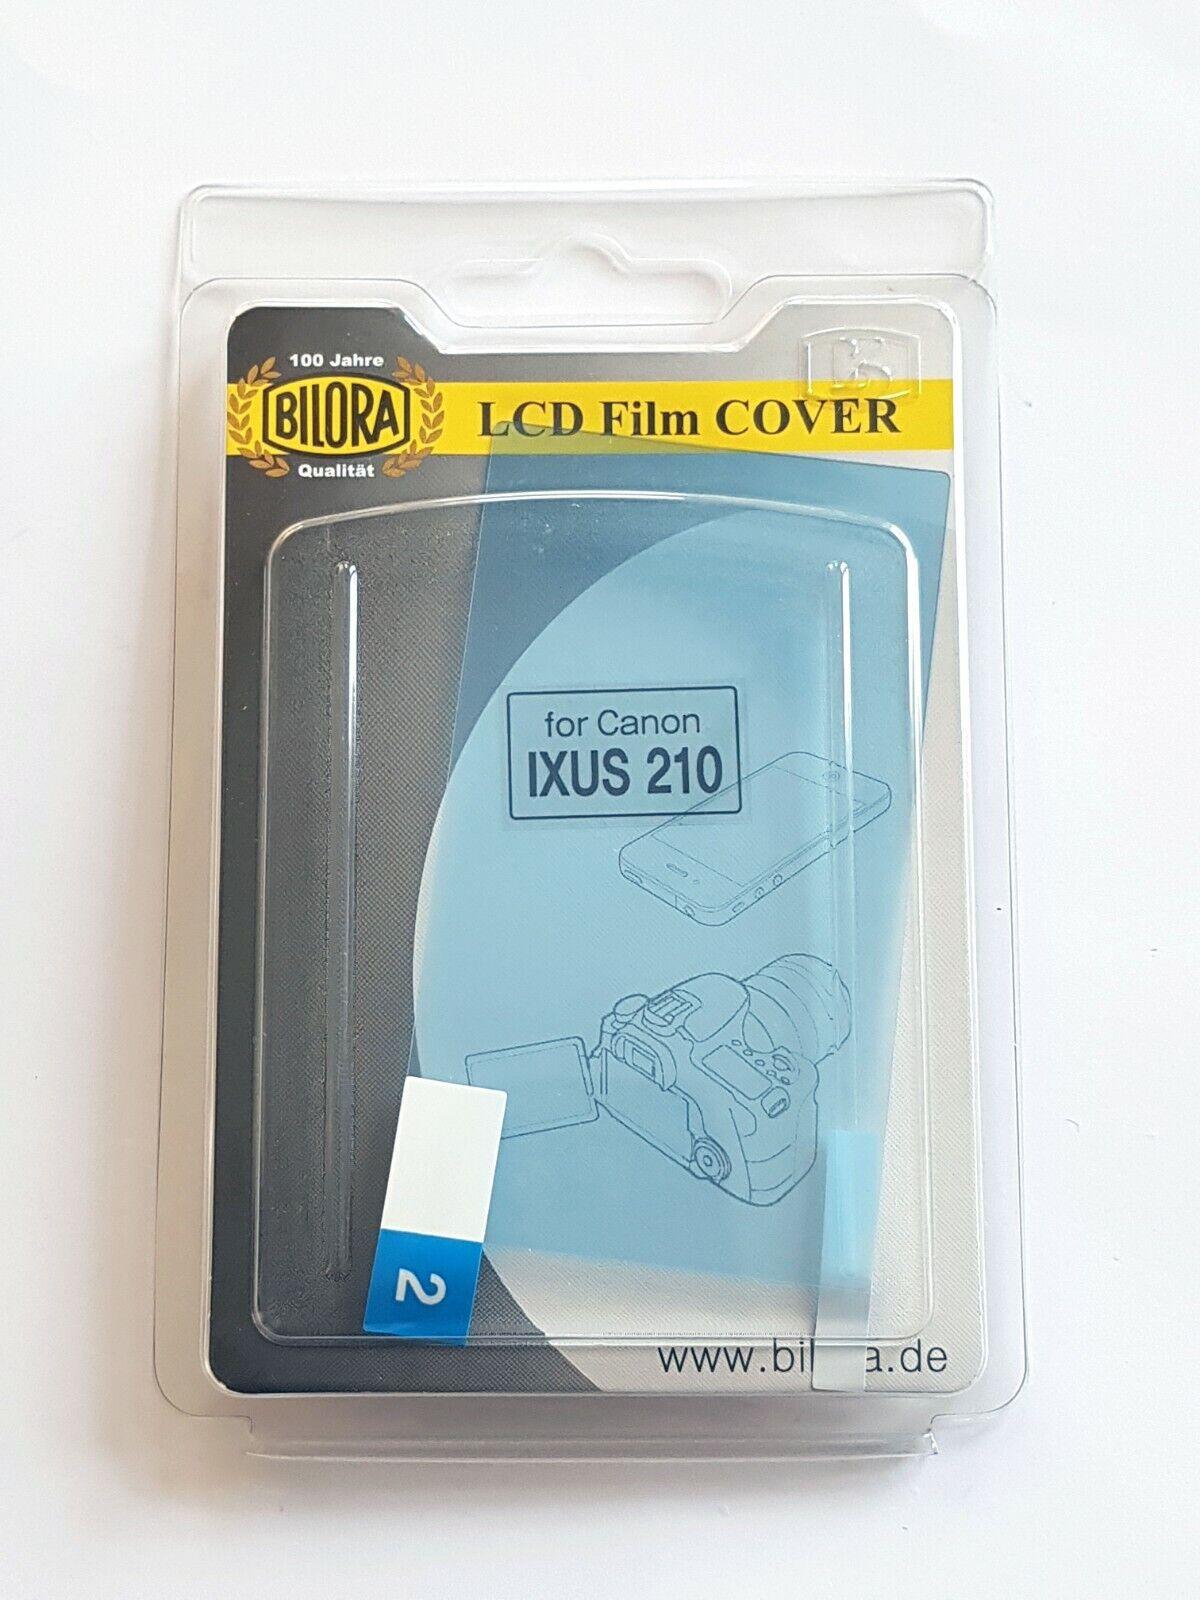 3 X BILORA LCD Film Cover Protective Film For CANON IXUS 210 New